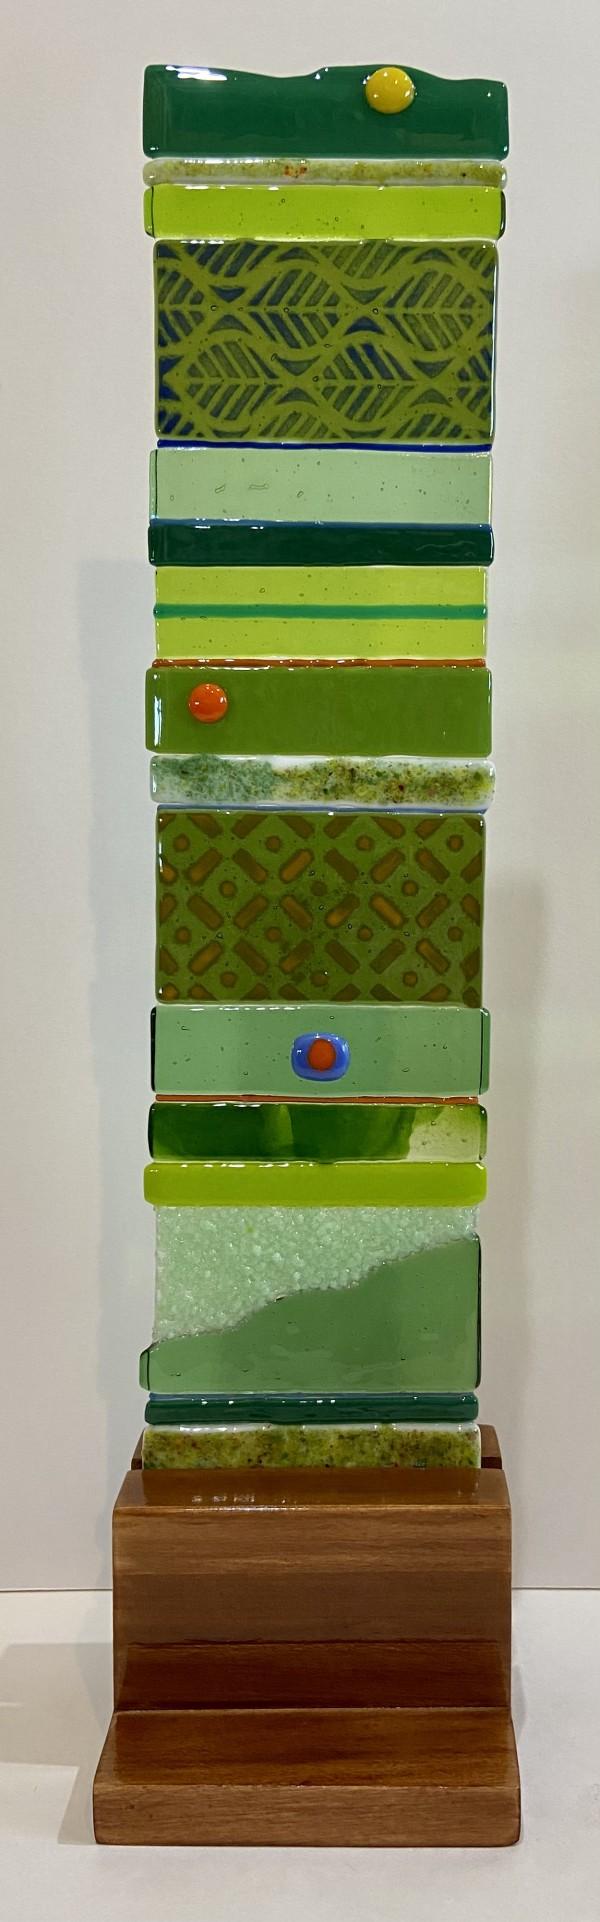 Green Elements by Cindy Cherrington